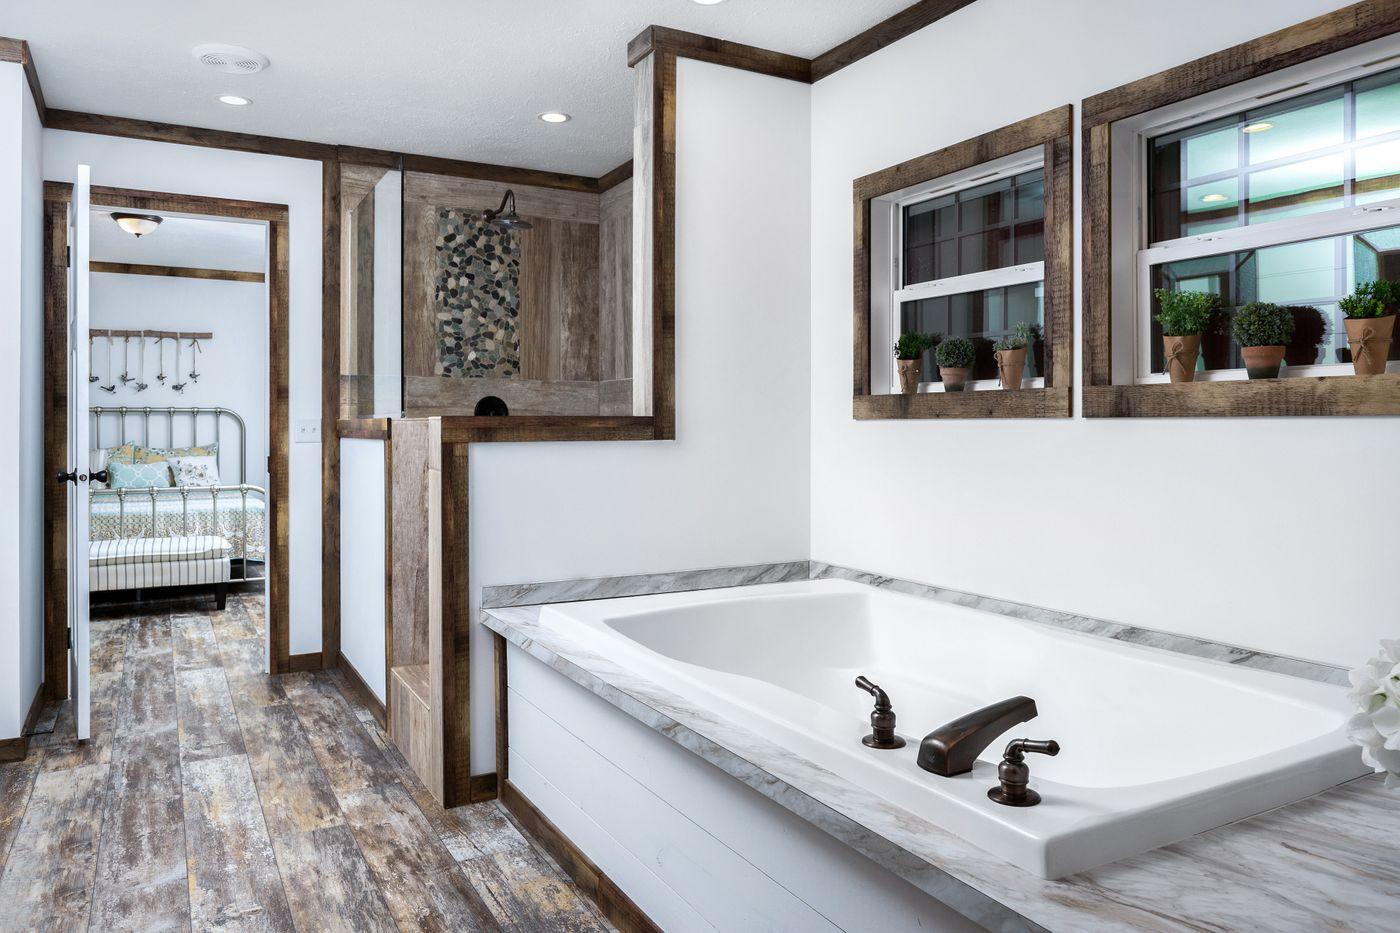 The Liza Jane Bathroom